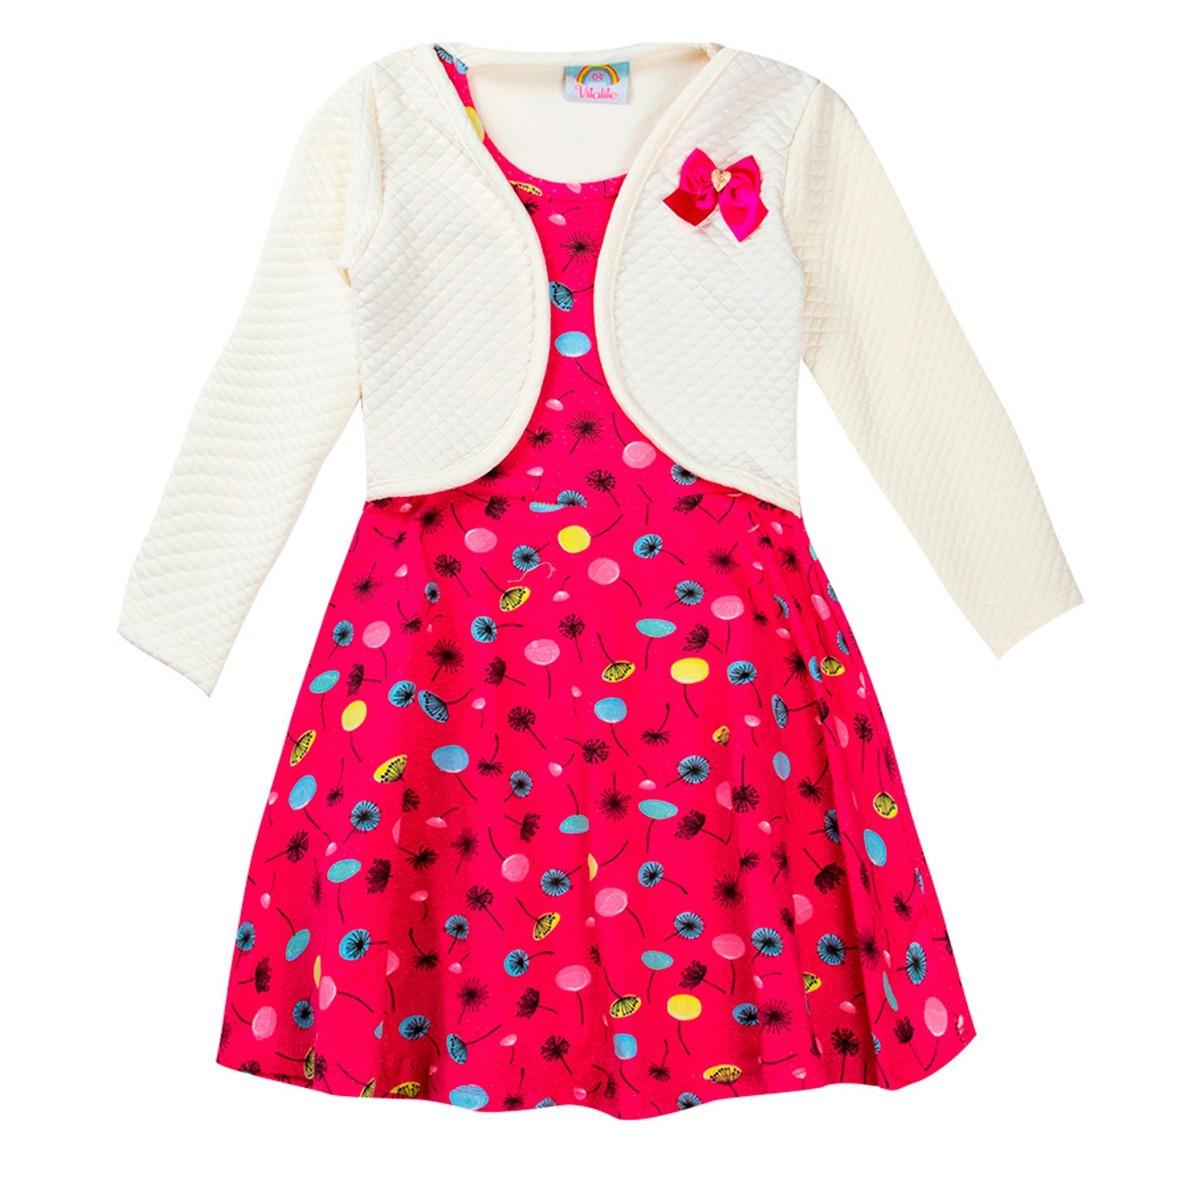 Vestido Infantil Com Bolero Estampado Pink - Vitalite